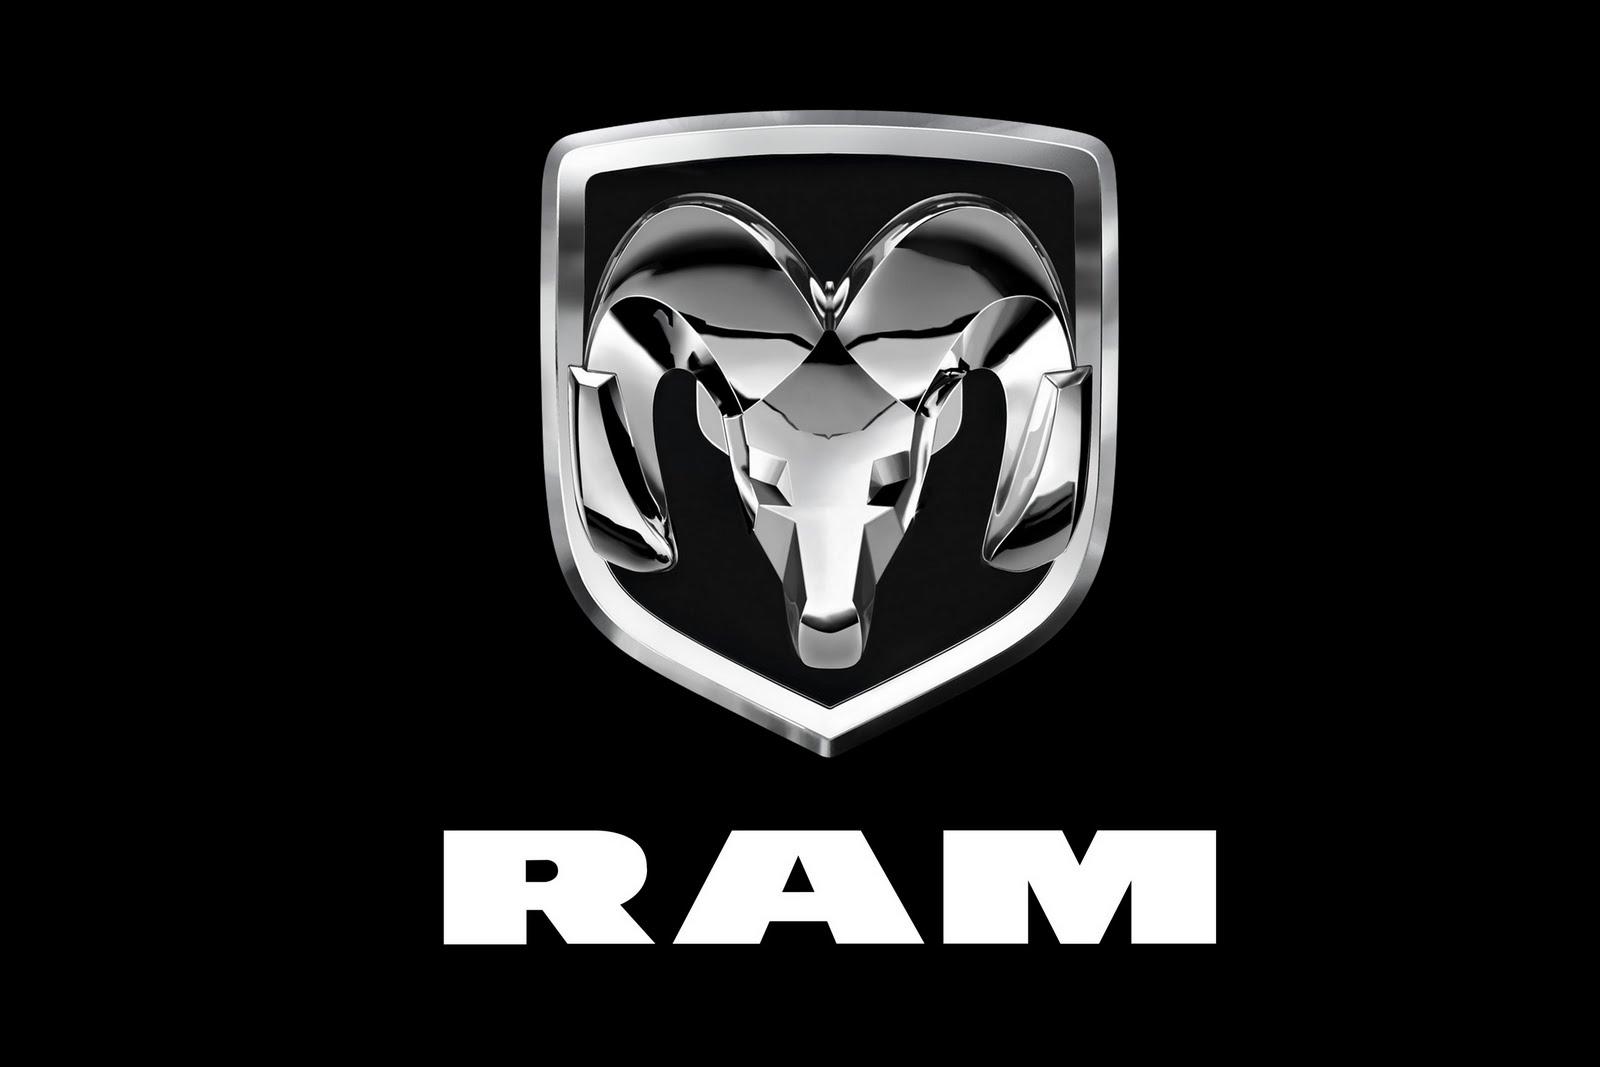 Best Wallpaper Logo Dodge Ram - dodge-ram-logo-wallpaper-33877-34638-hd-wallpapers  You Should Have_964386.jpg